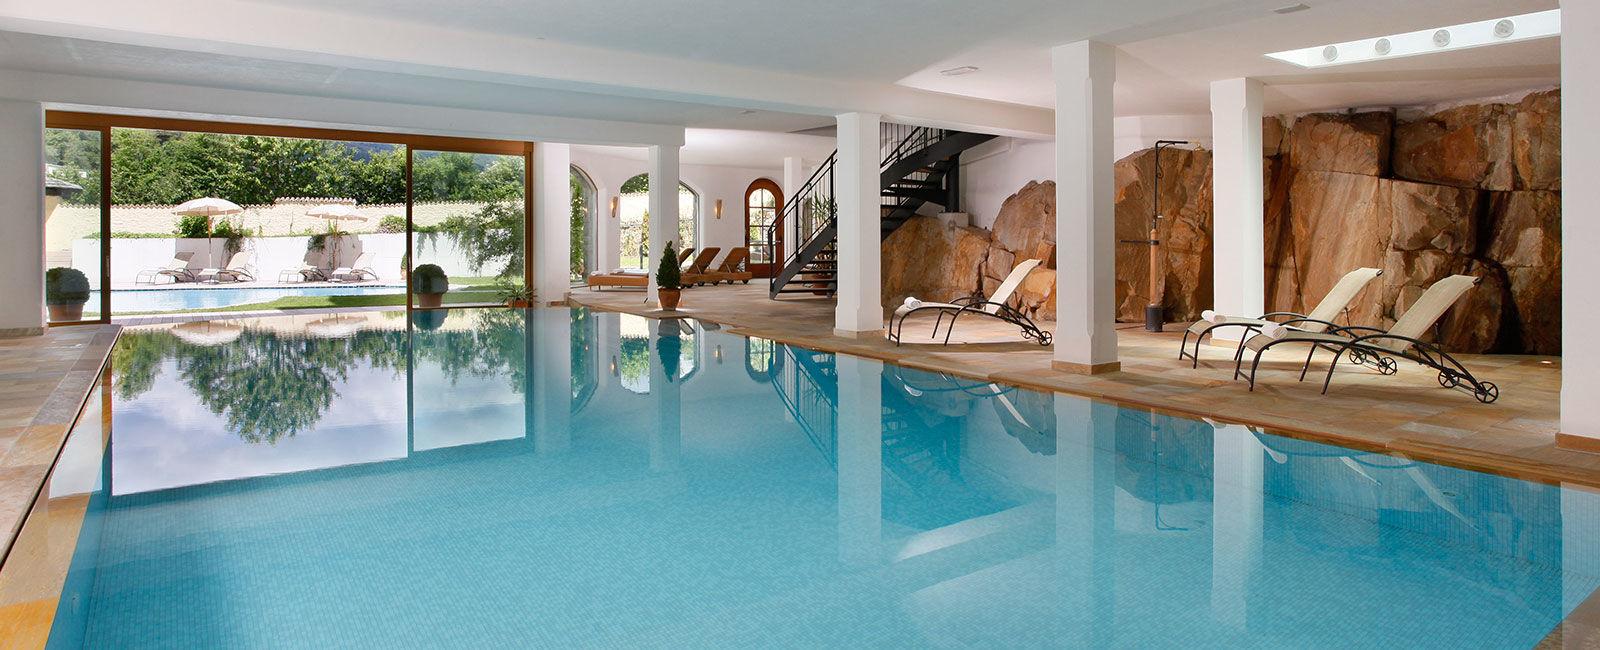 4-Sterne Hotel mit Pool in Südtirol | Gartenhotel Völser Hof